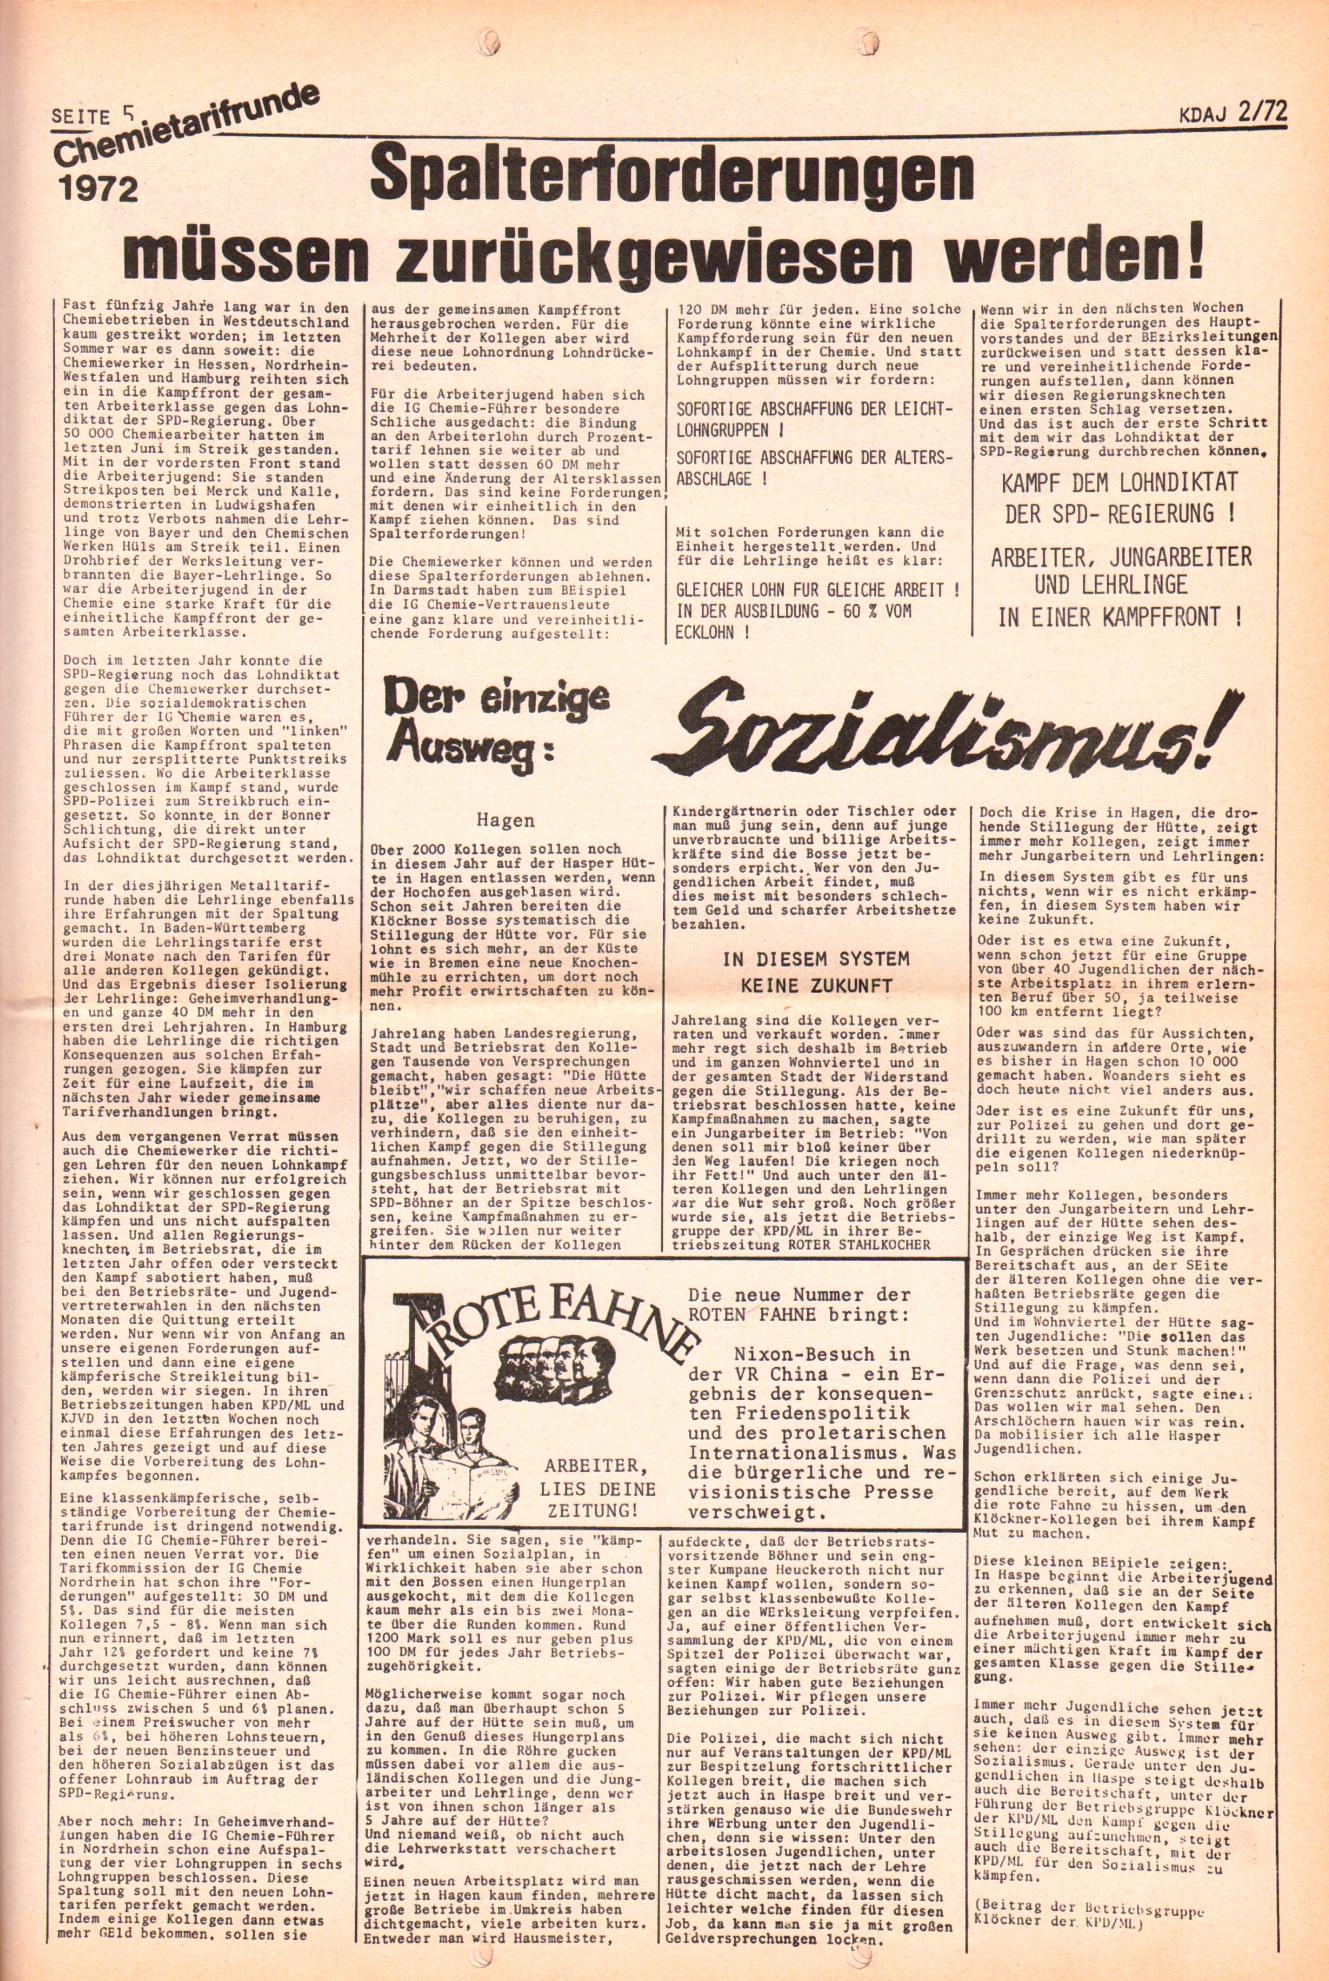 KDAJ, 3. Jg., März 1972, Nr. 2, Seite 5